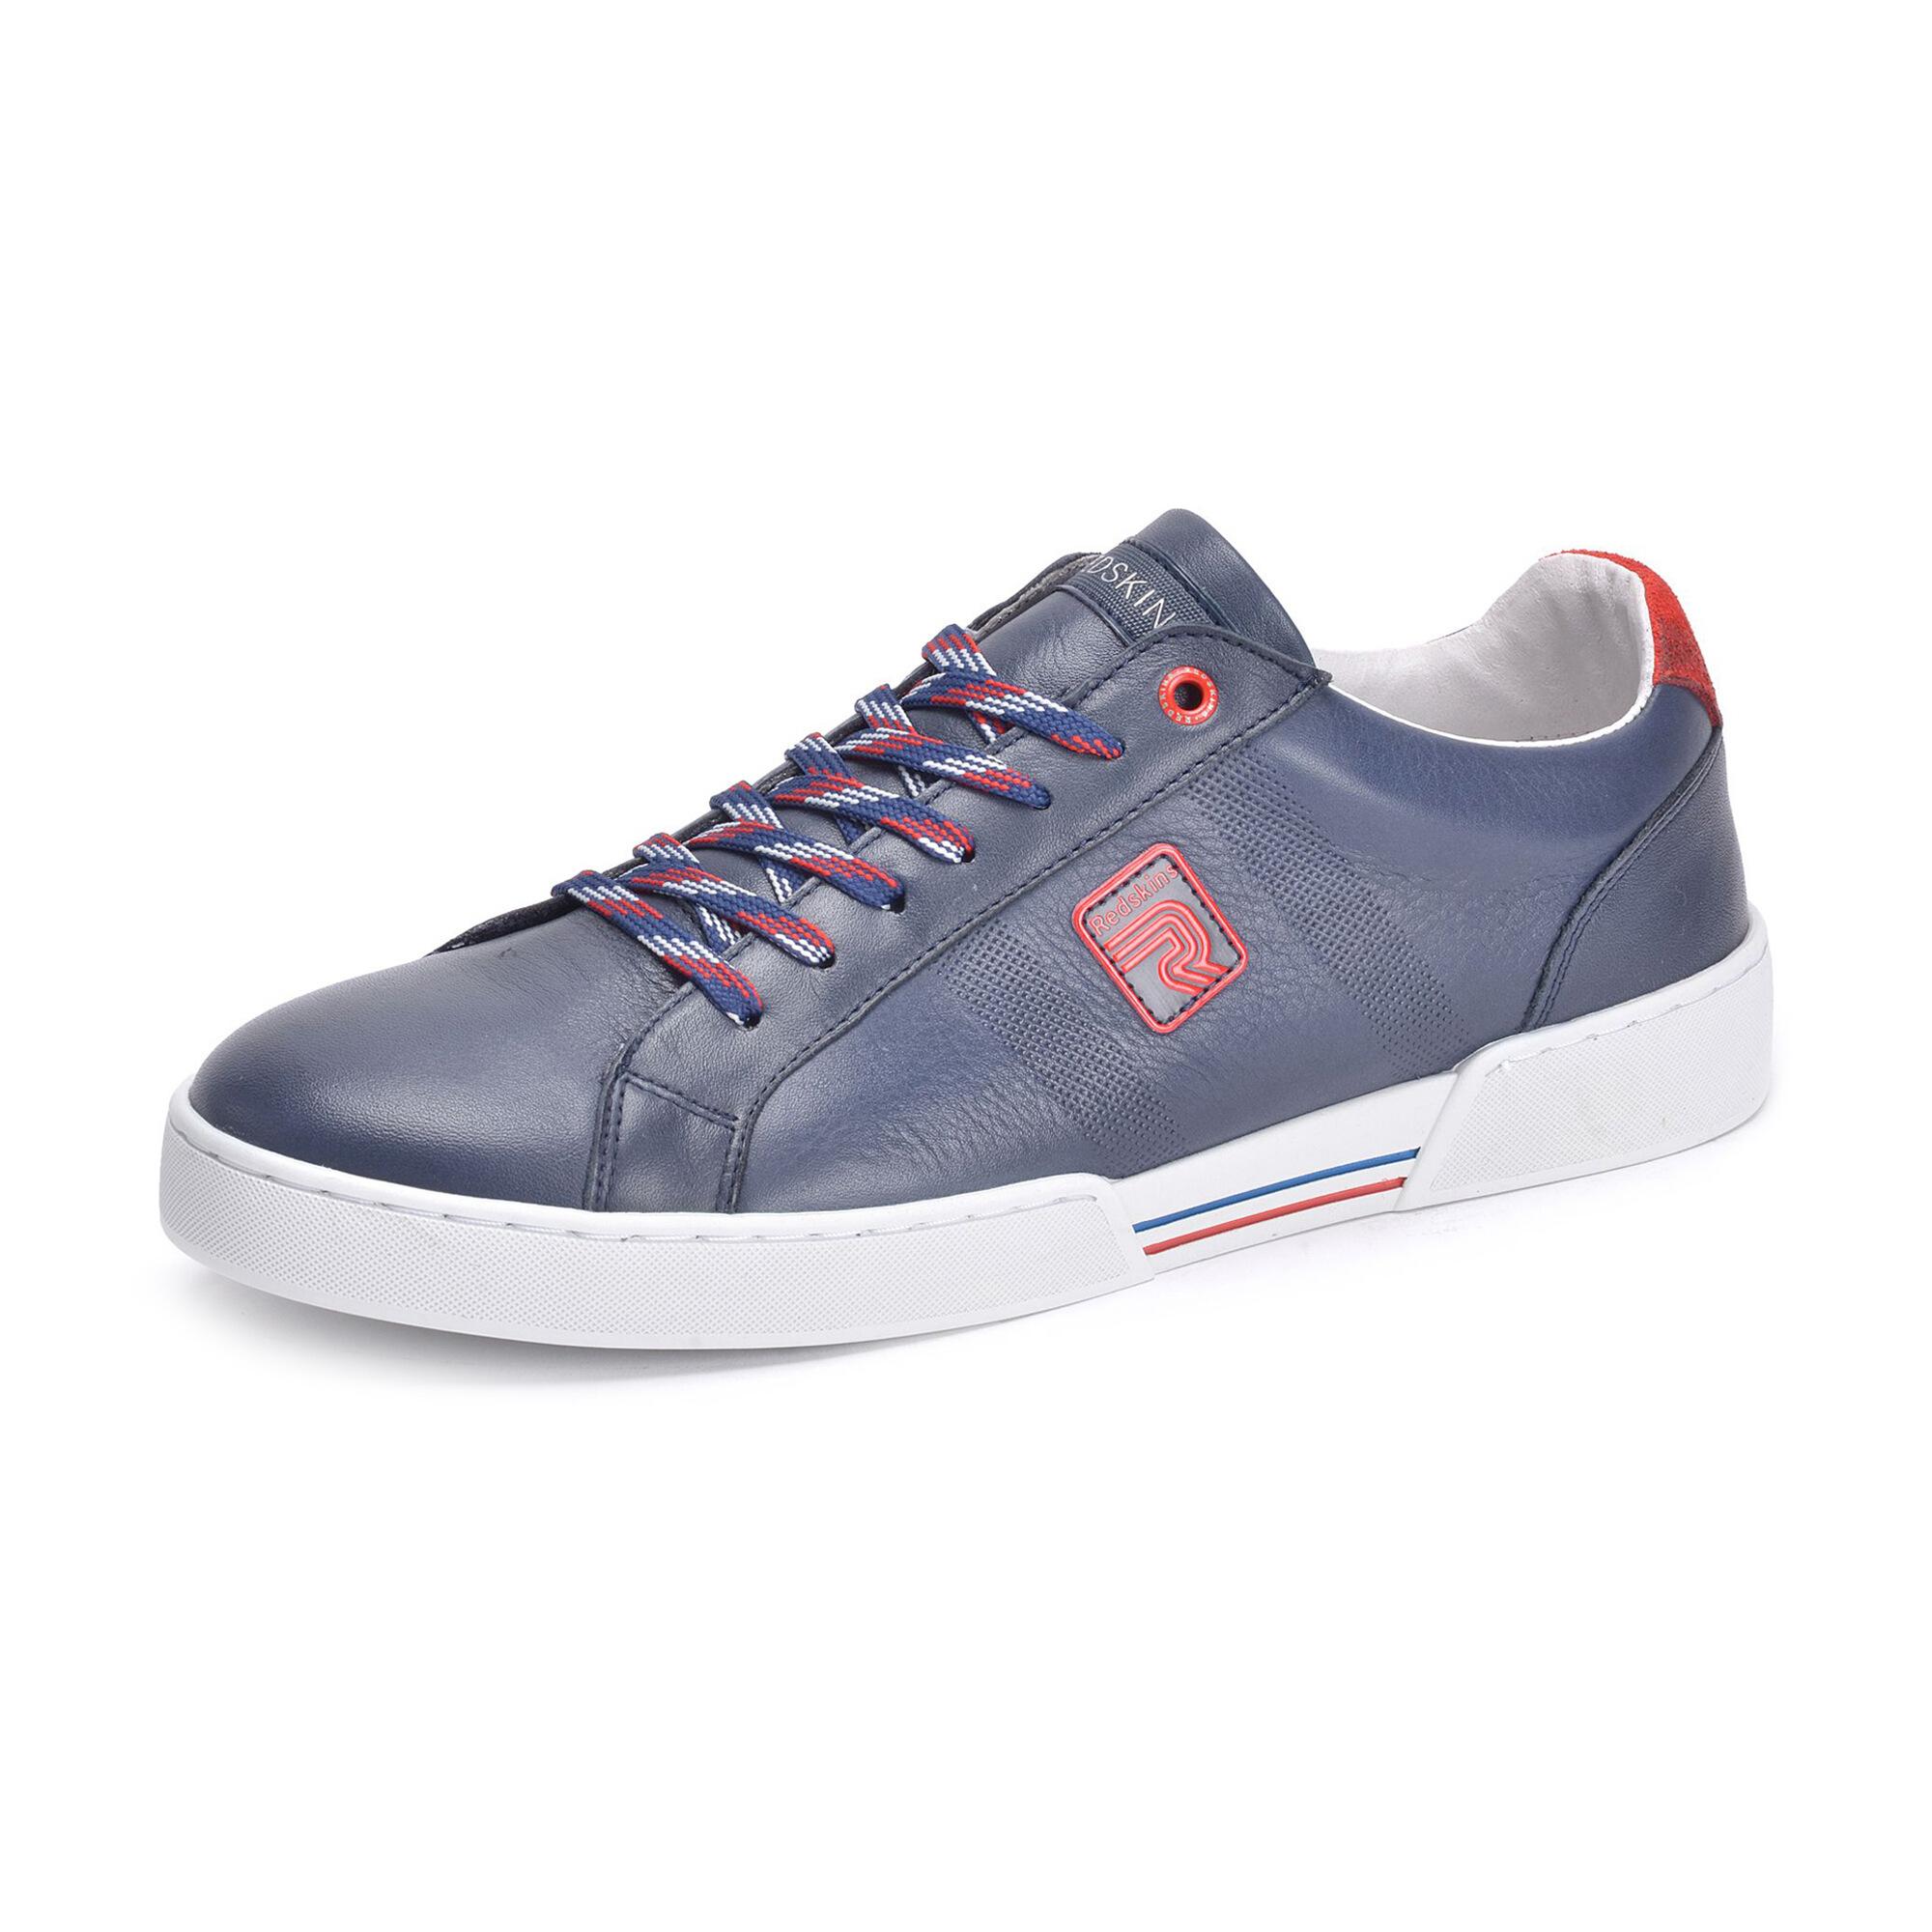 Chaussures en cuir Redskins Warrior - Bleu marine et rouge